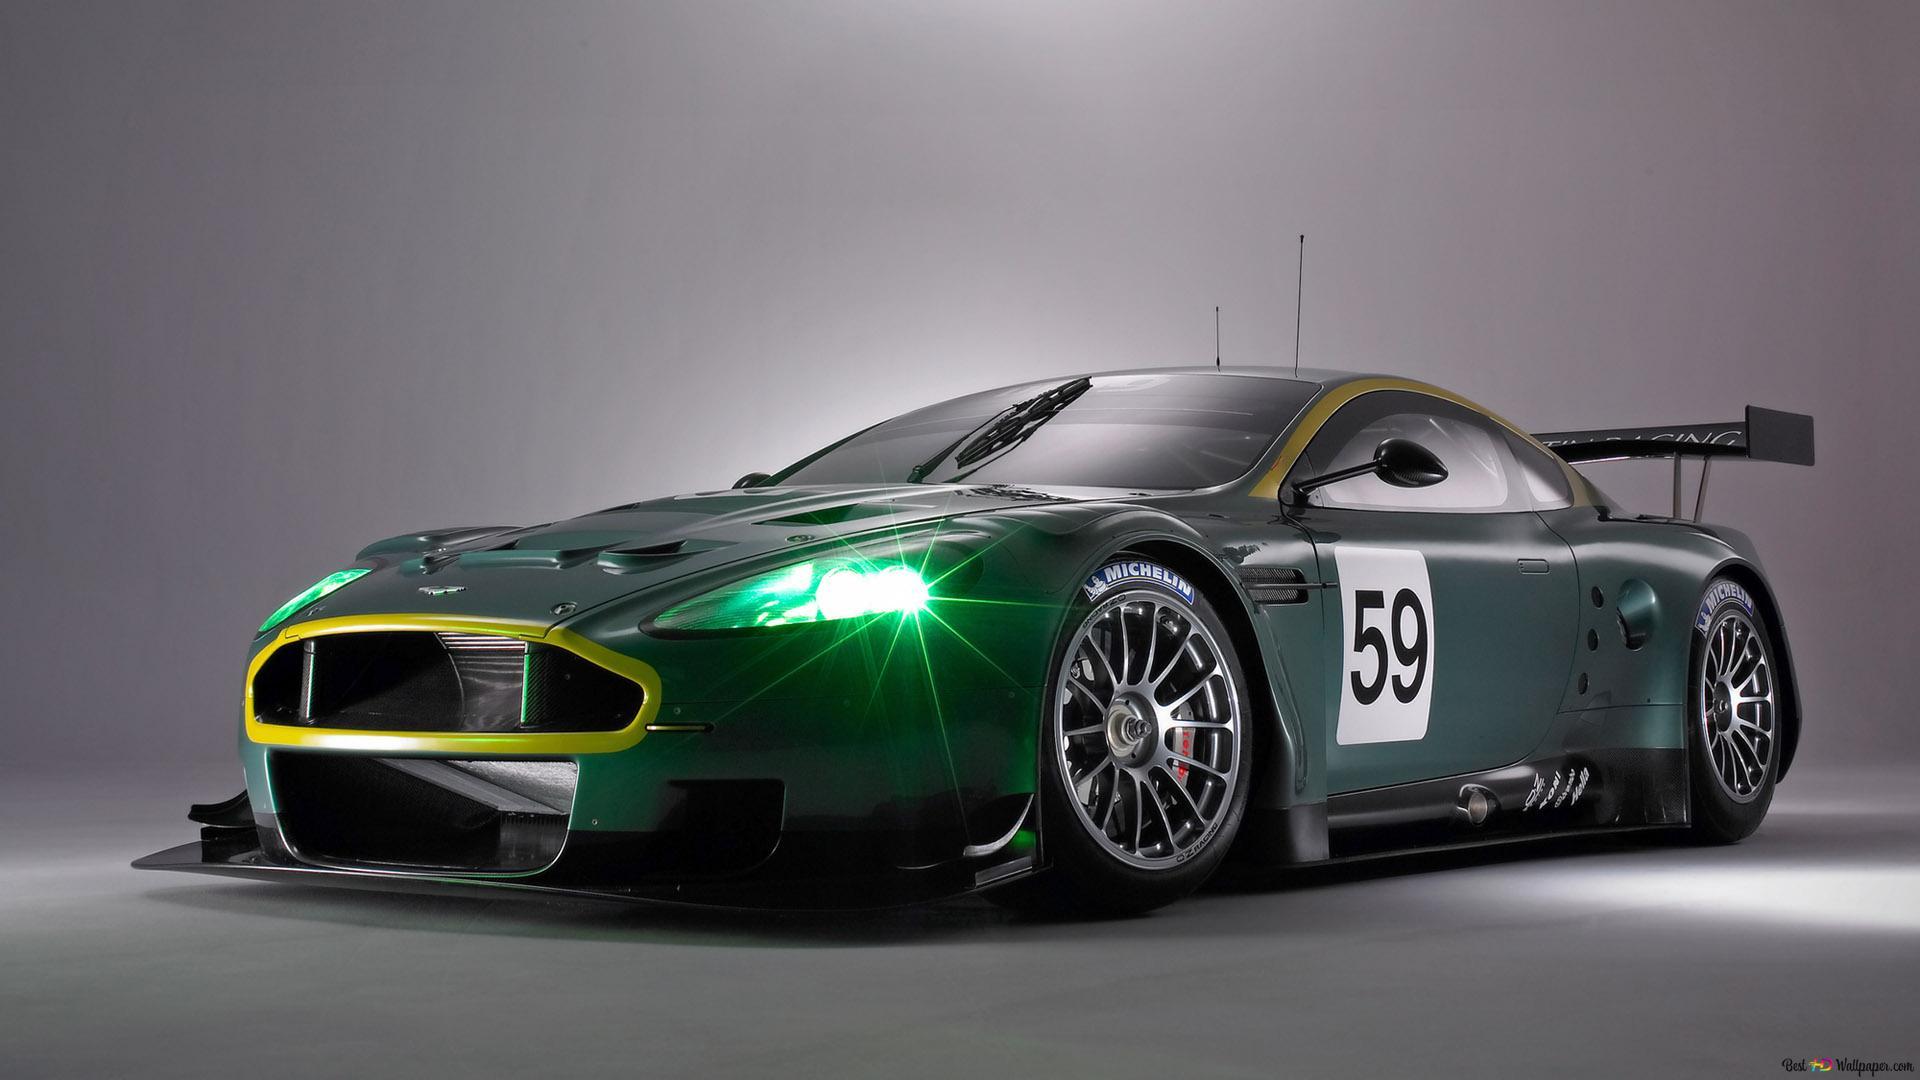 Aston Martin Dbr9 Sport Car Hd Wallpaper Download